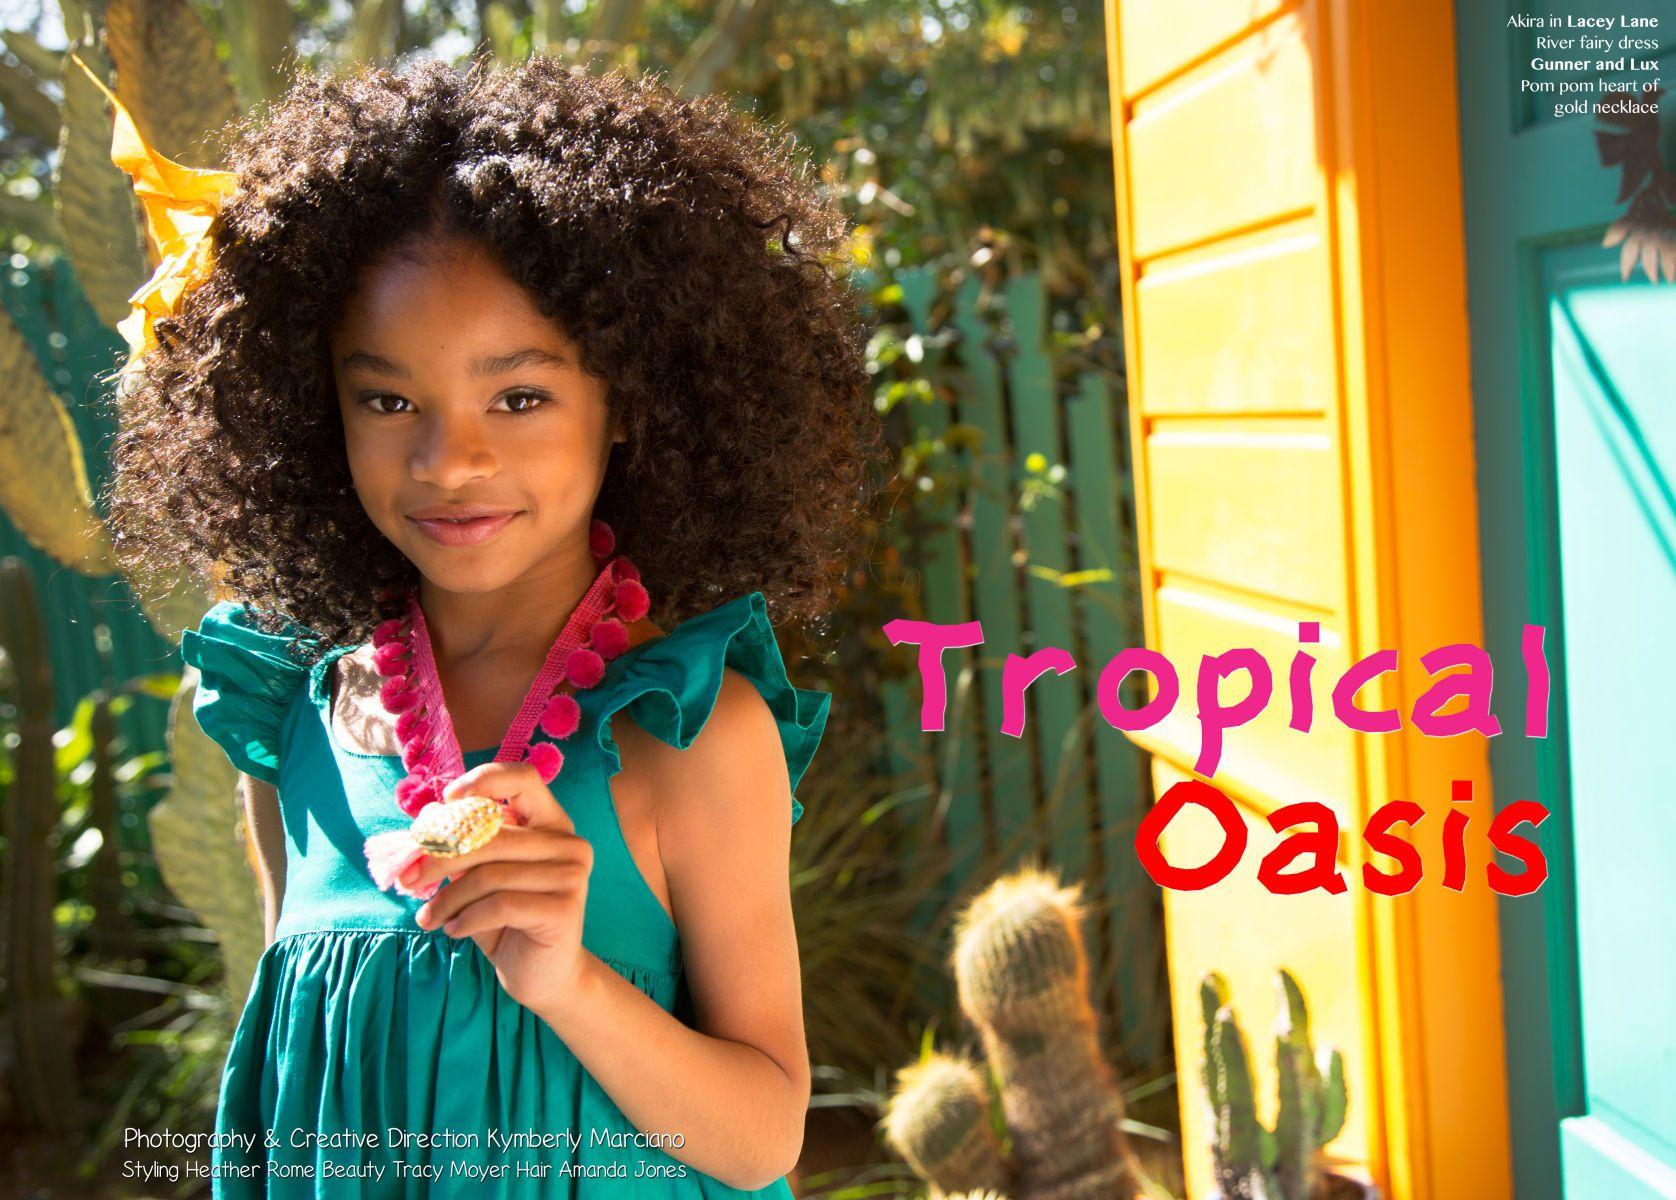 1tropical_oasis_minimaven_1_2